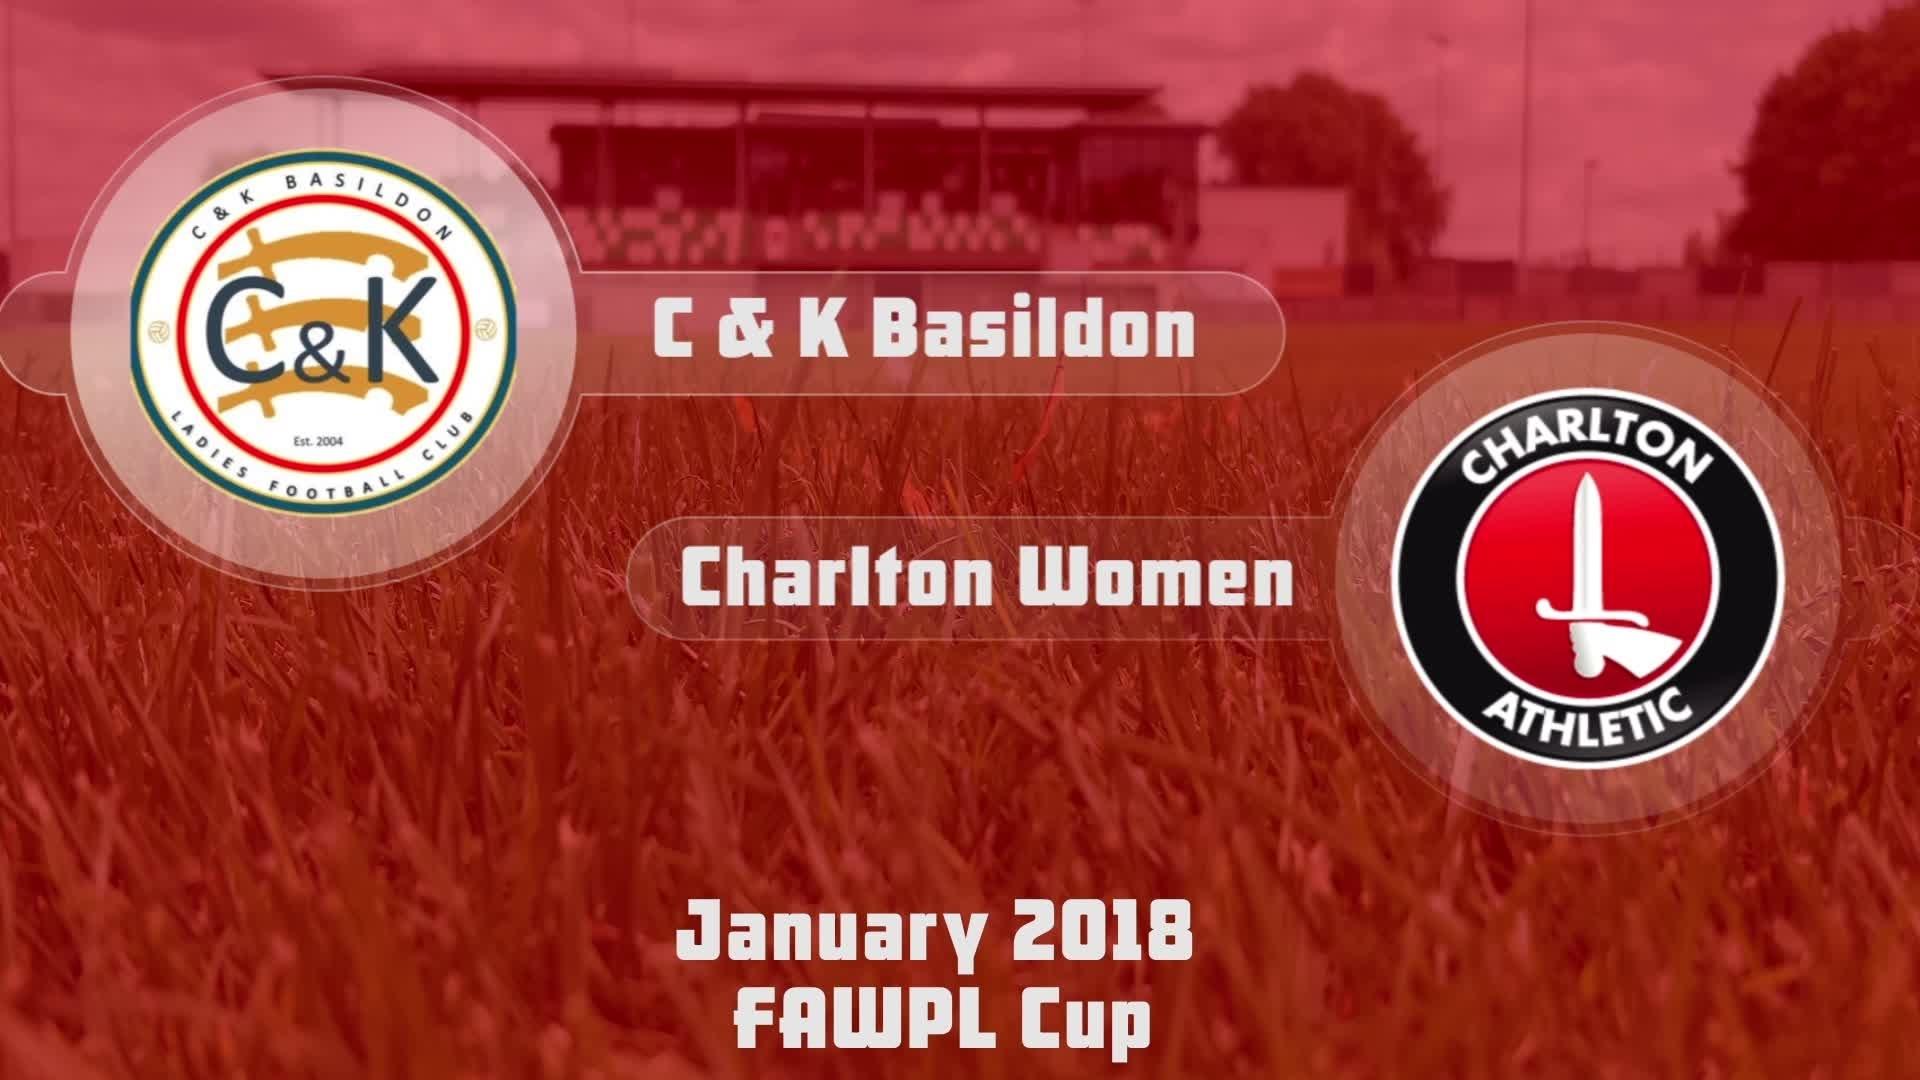 WOMEN HIGHLIGHTS | C & K Basildon 1 Charlton 2 (FAWPL Cup Jan 2018)